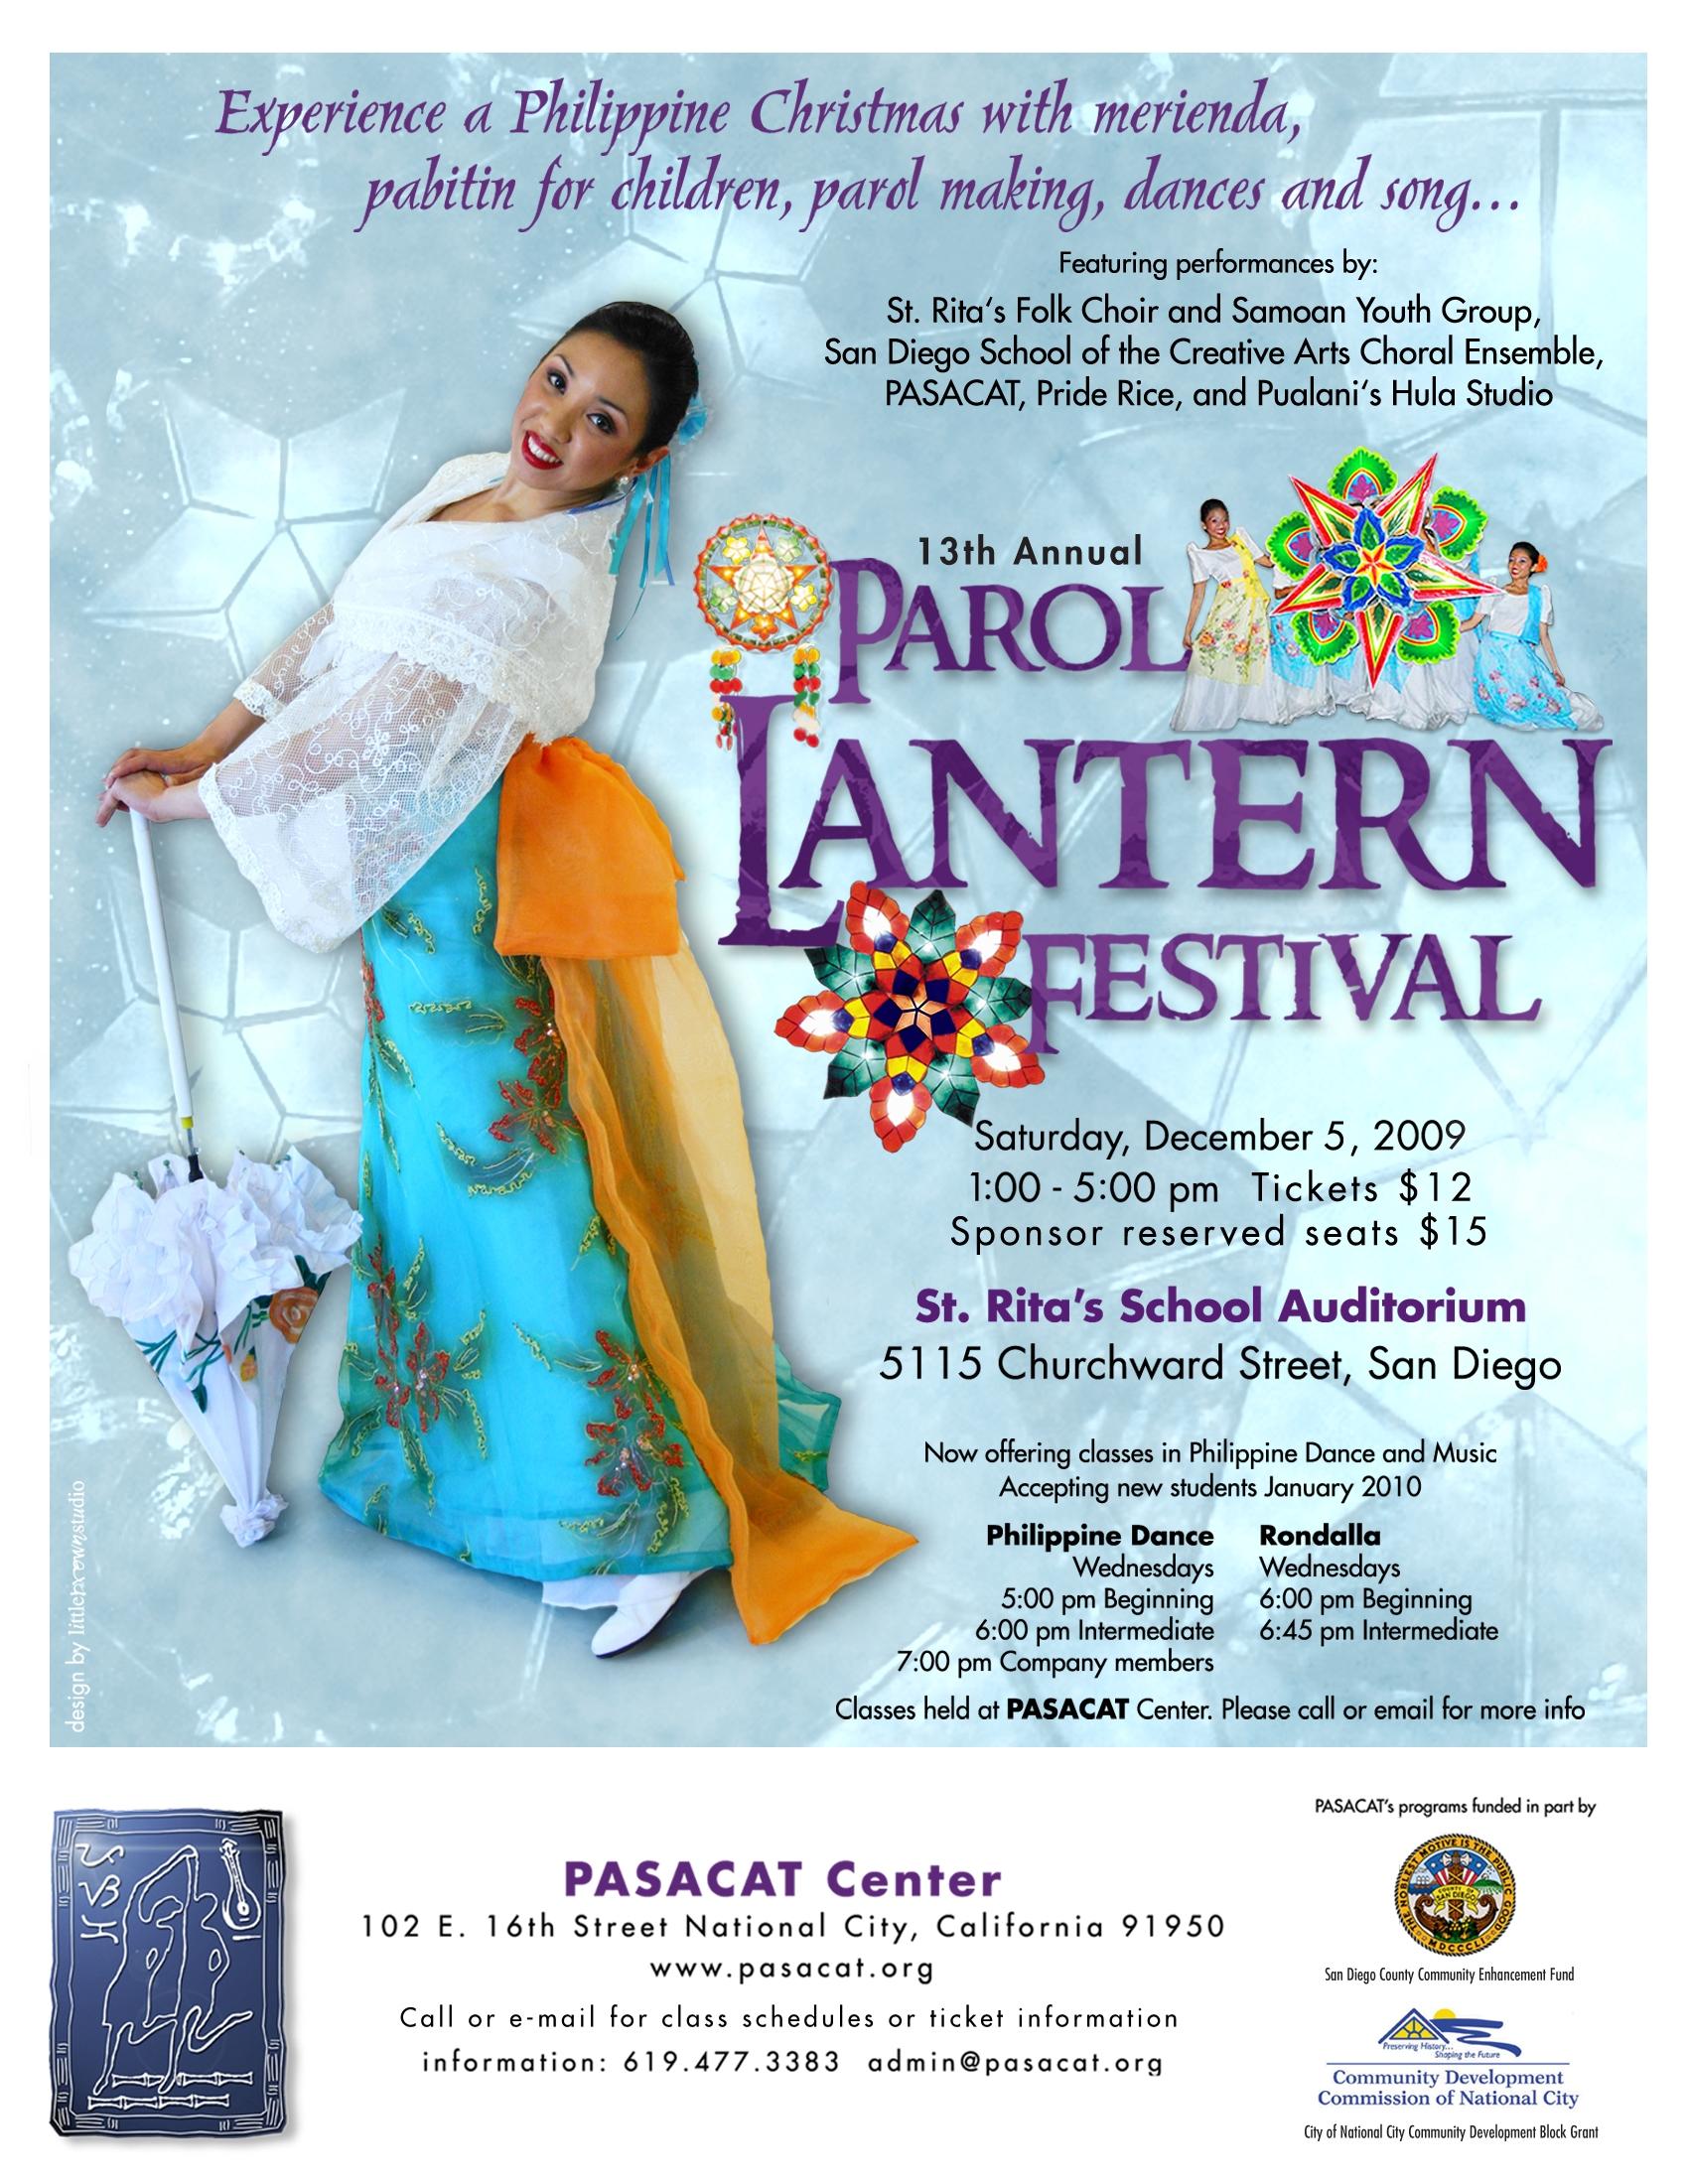 PASACAT Parol Lantern Festival 2009-12-05